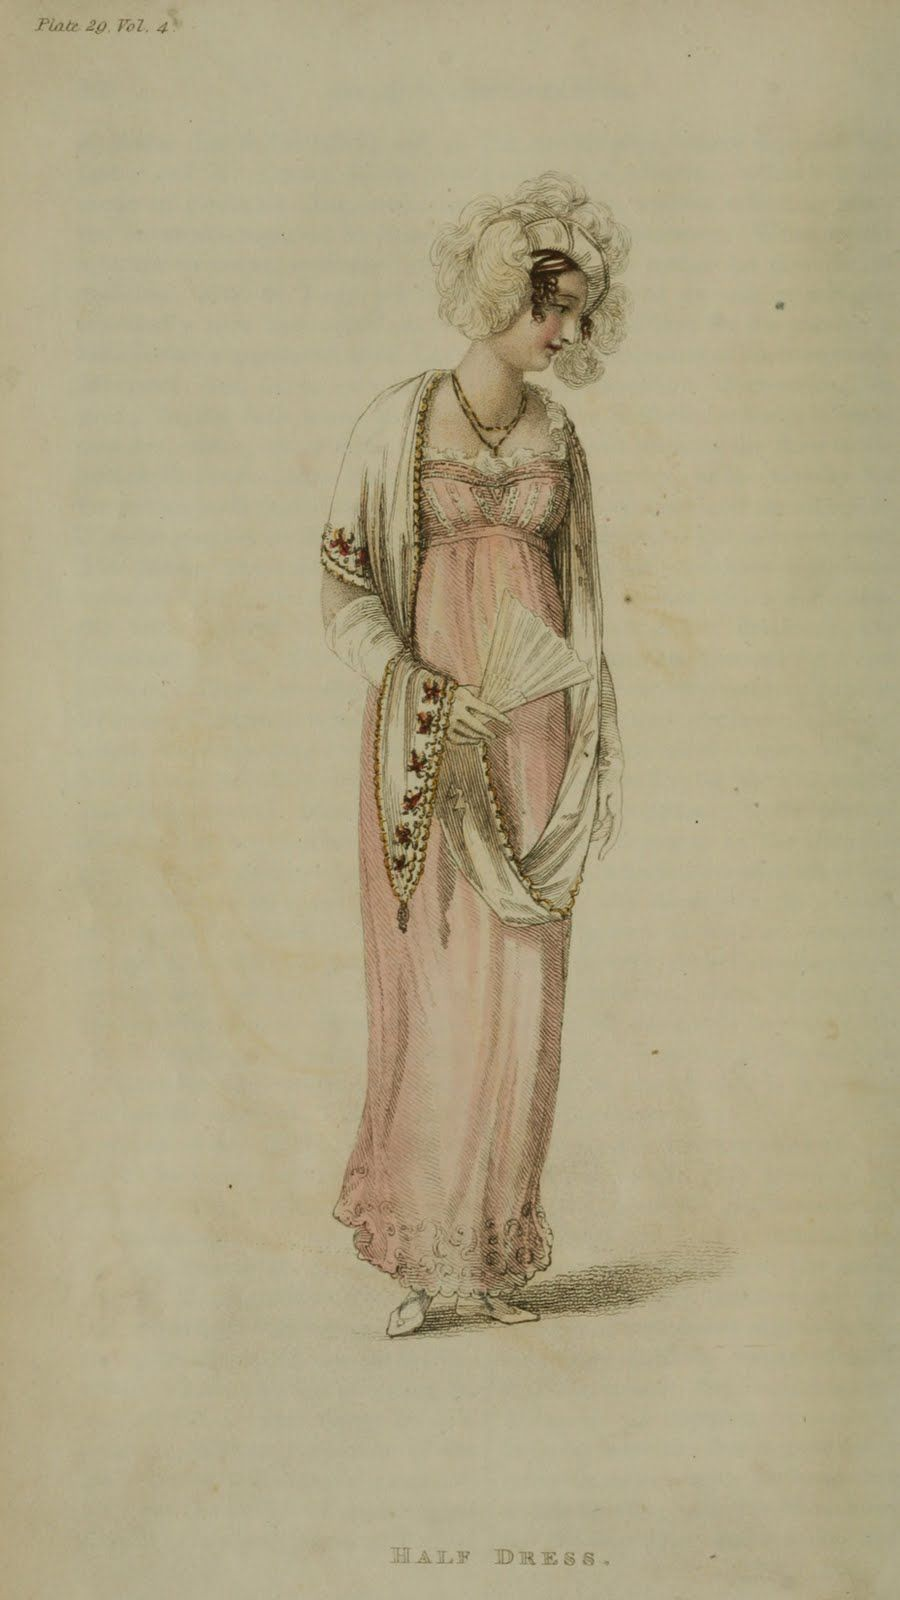 1810 - Ackermann's Repository Series1 Vol 4 - November Issue